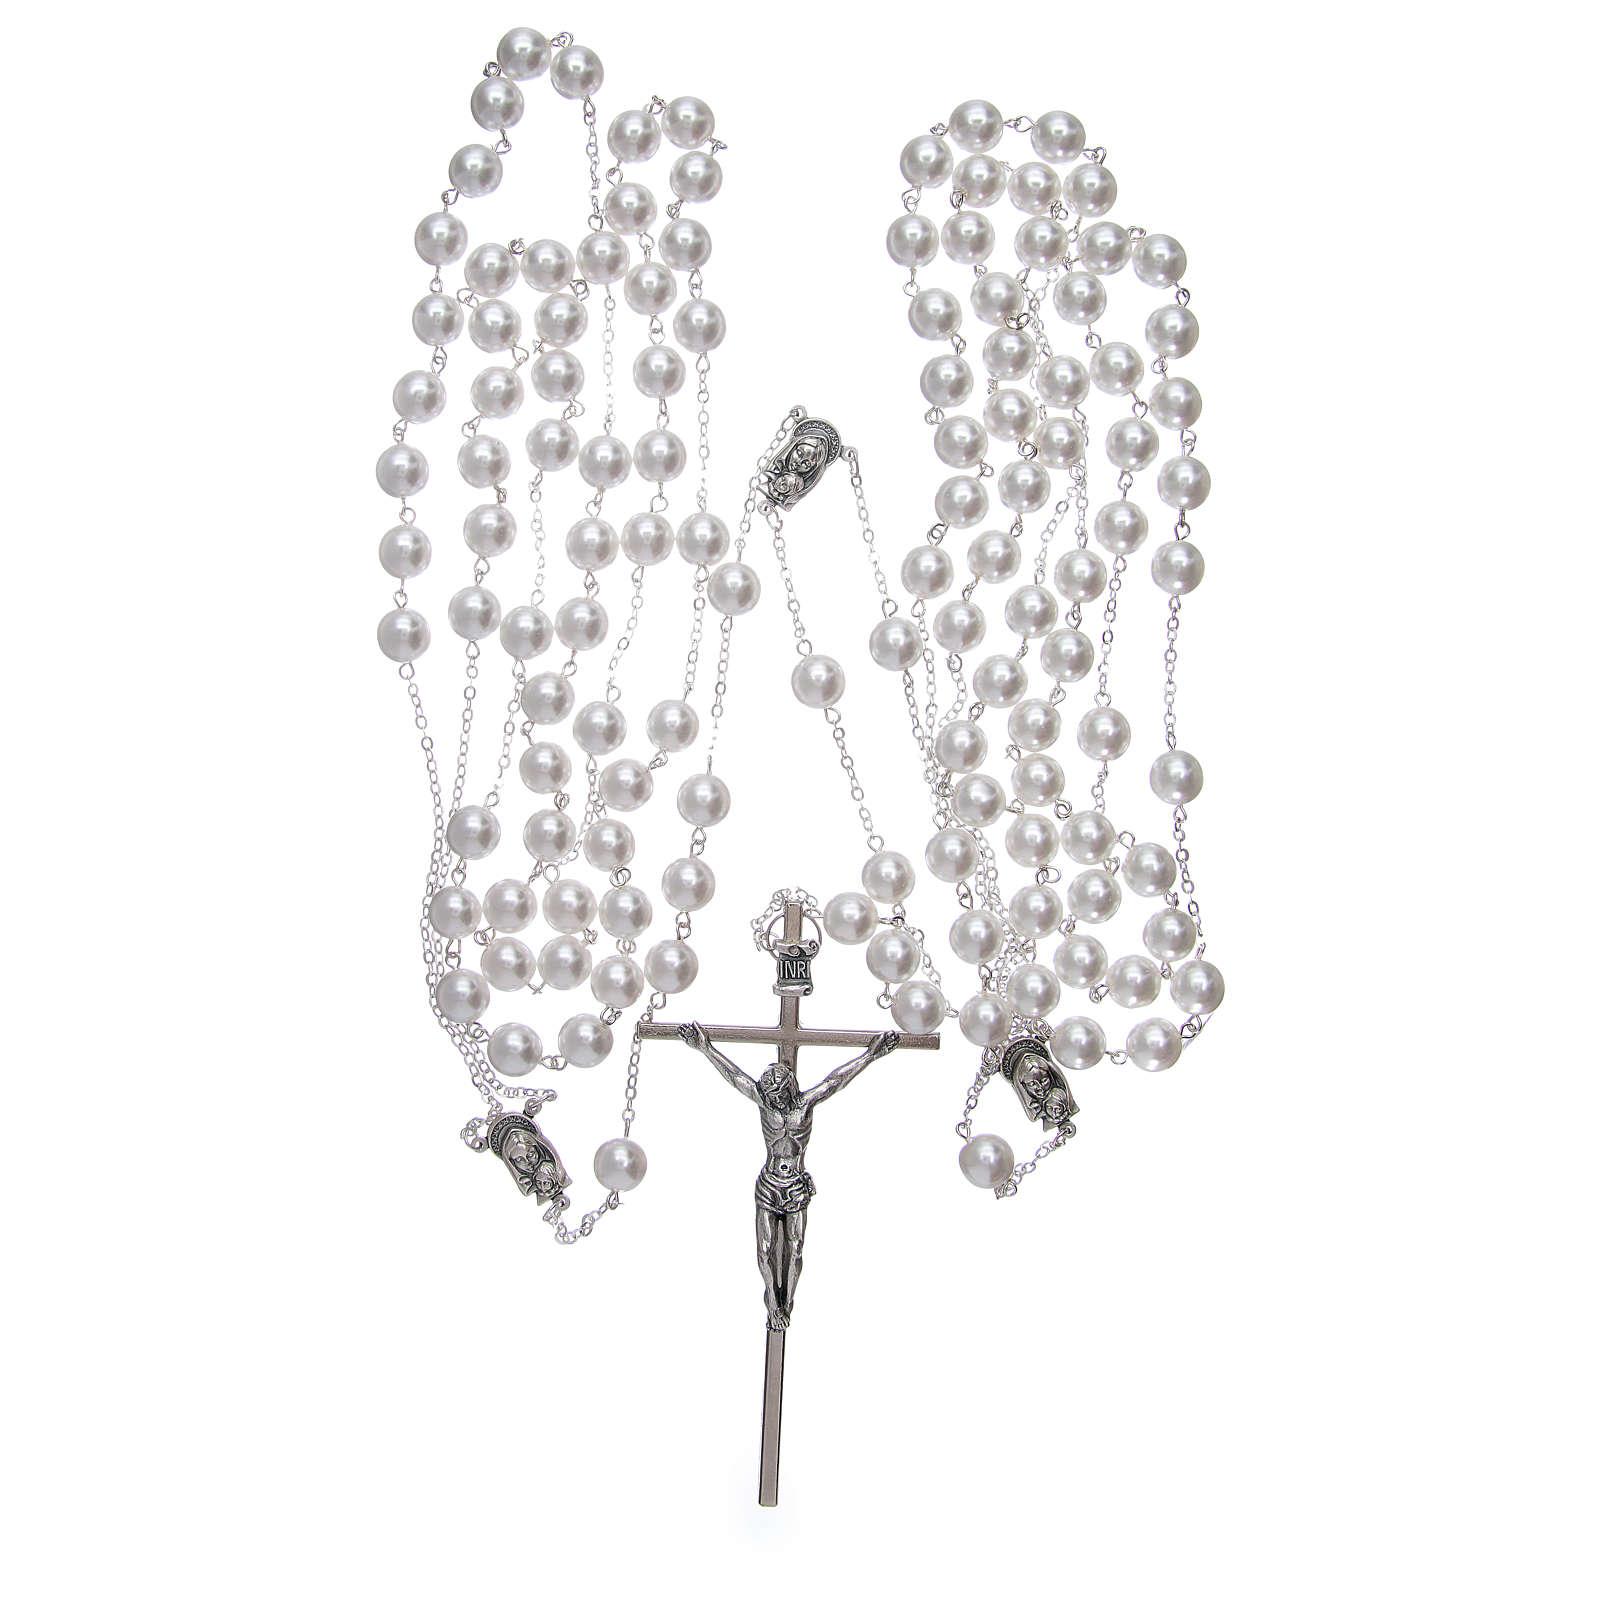 Doble rosario de boda con cuentas nacaradas 4